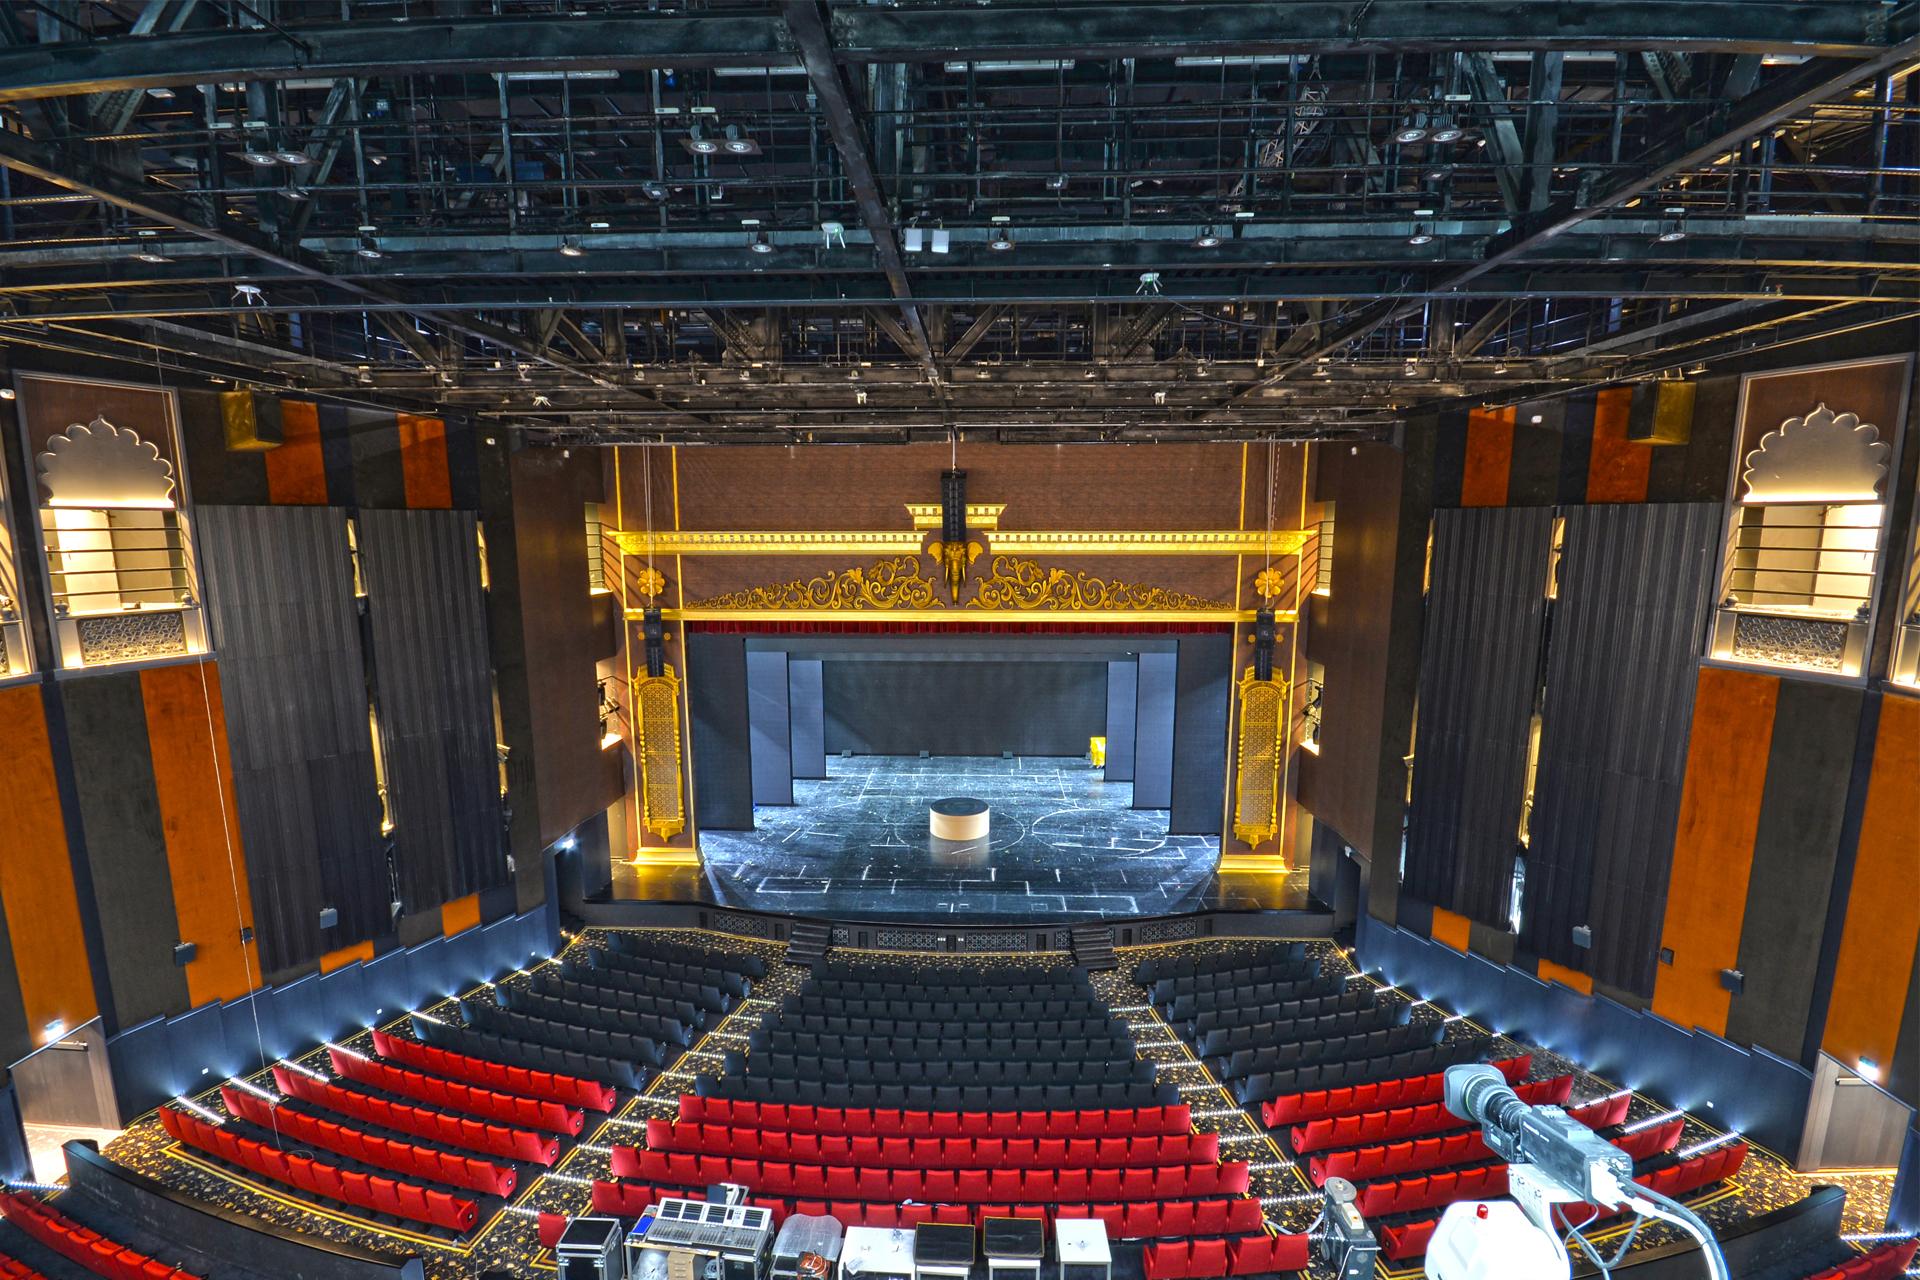 Rajmahal theatre dubai uae for Hispano international decor llc abu dhabi